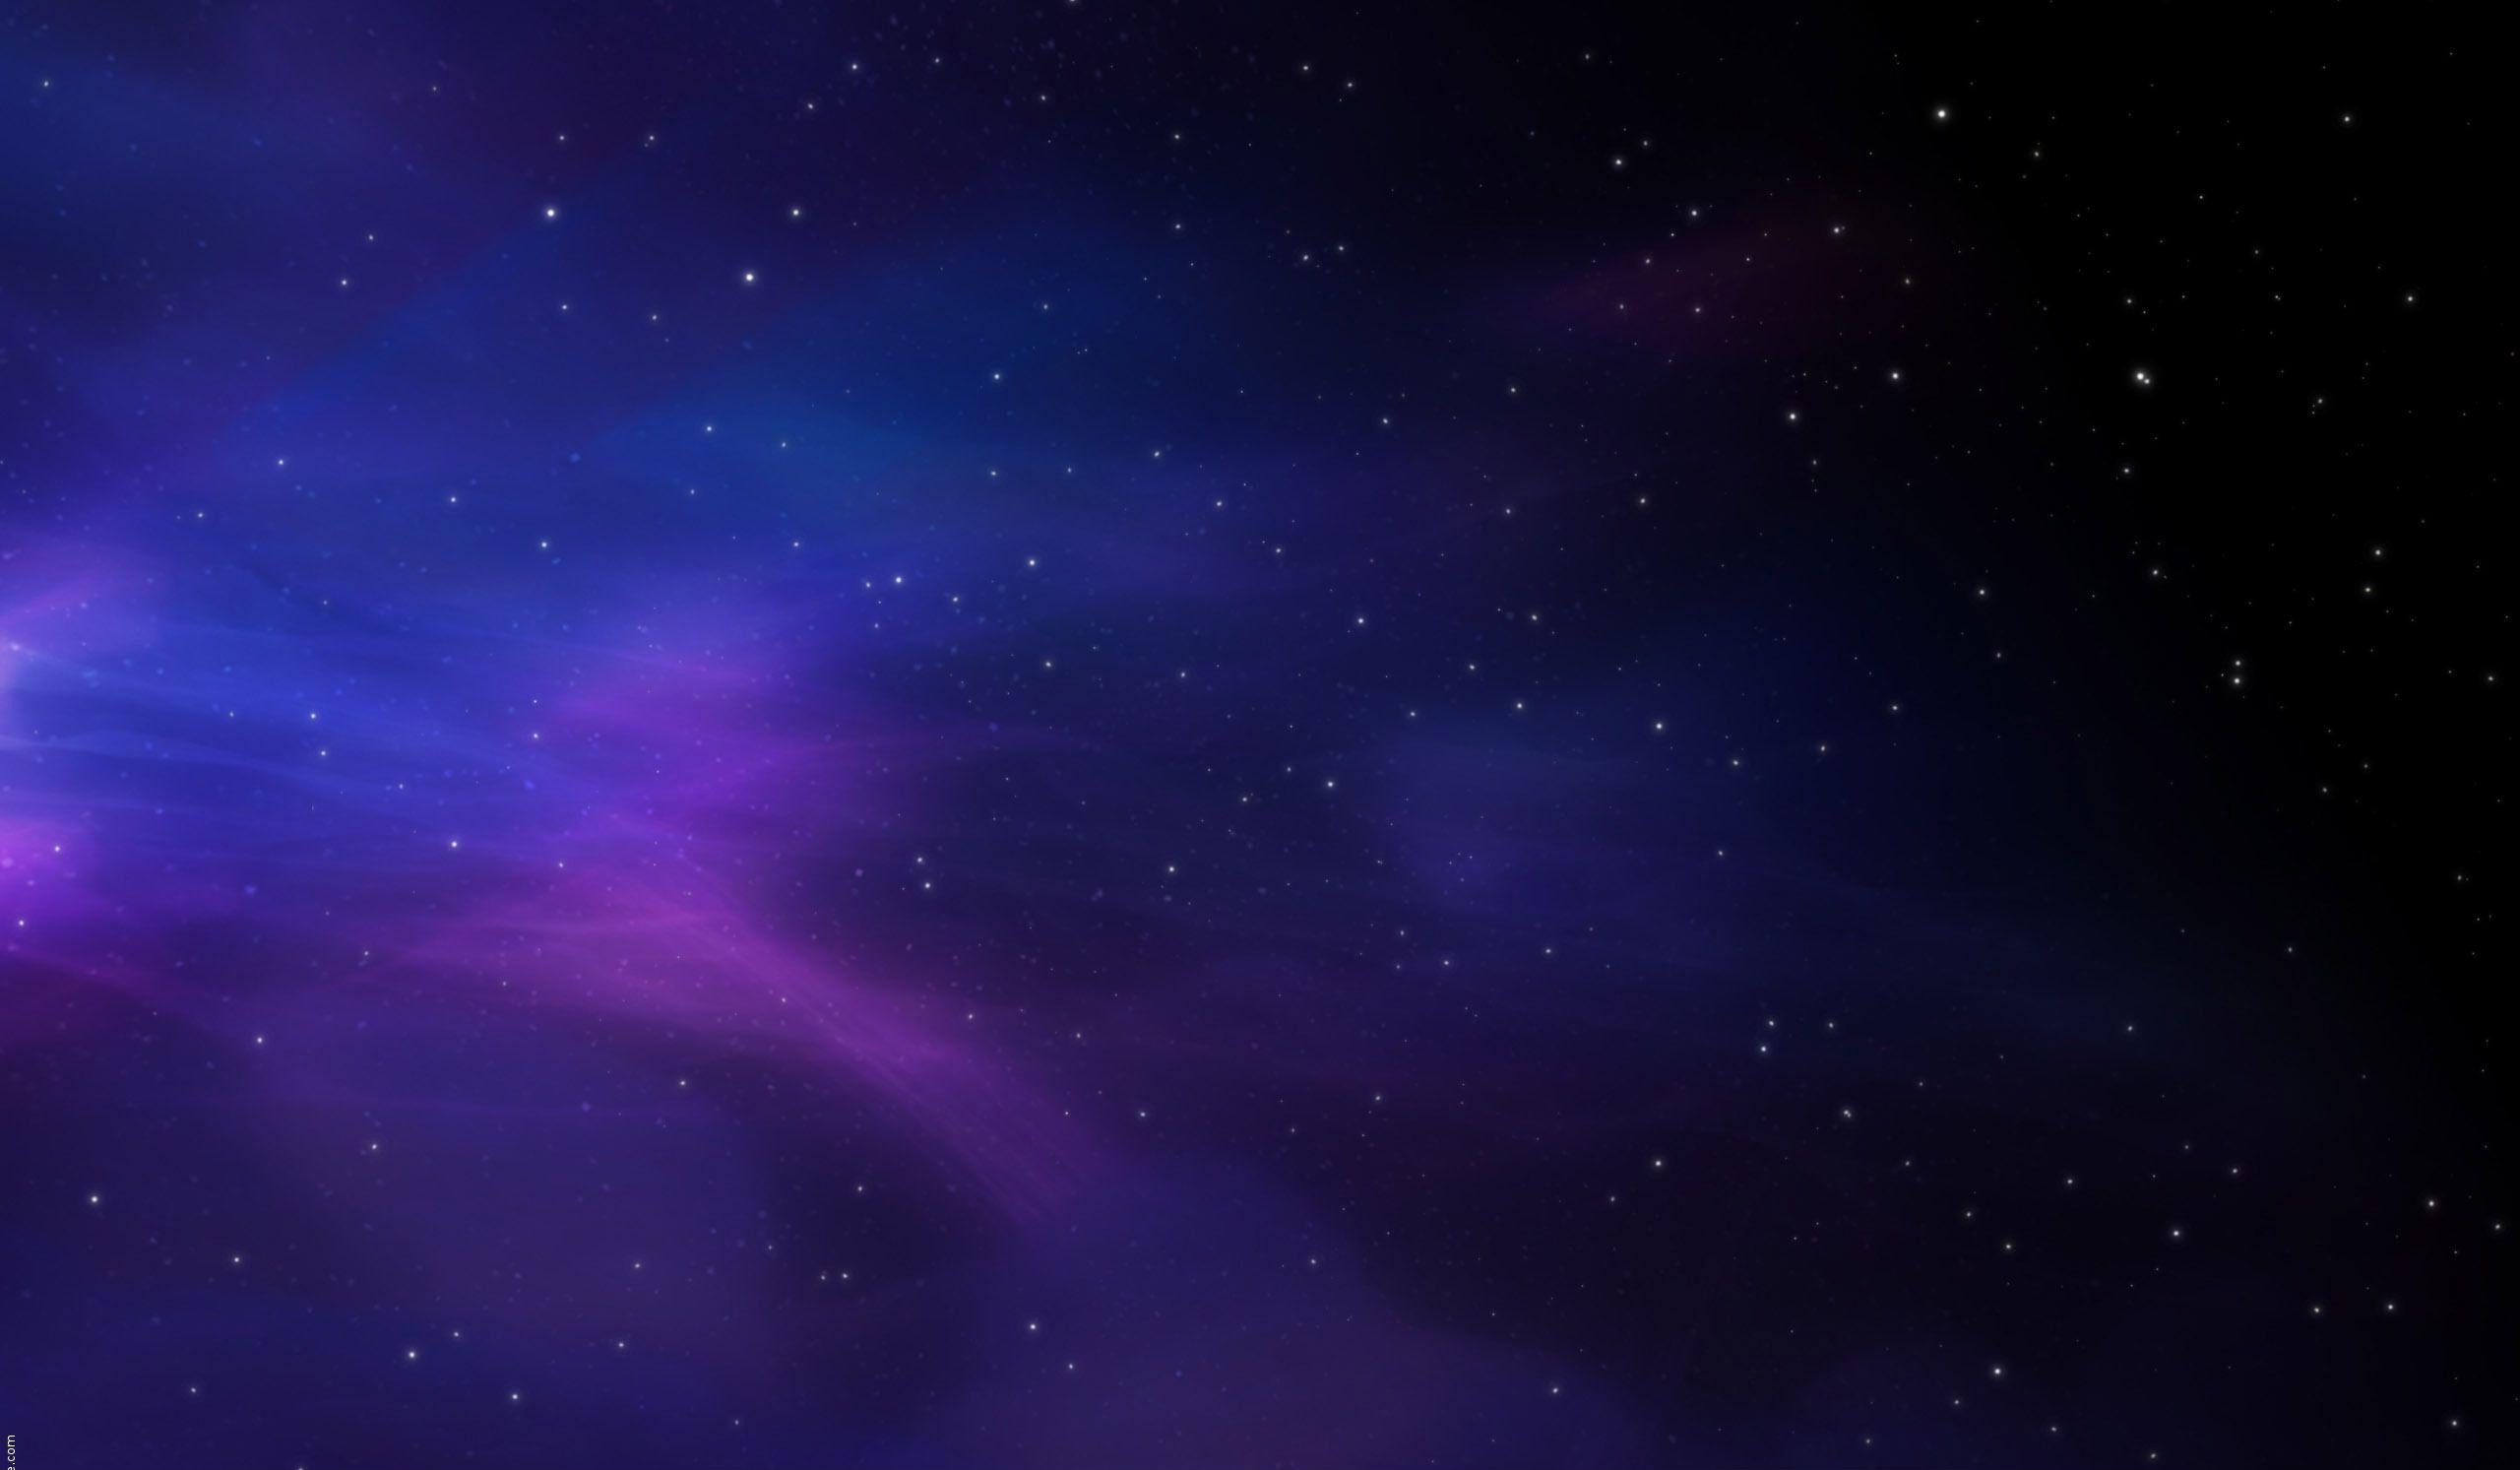 Galaxy Wallpaper Tumblr 038